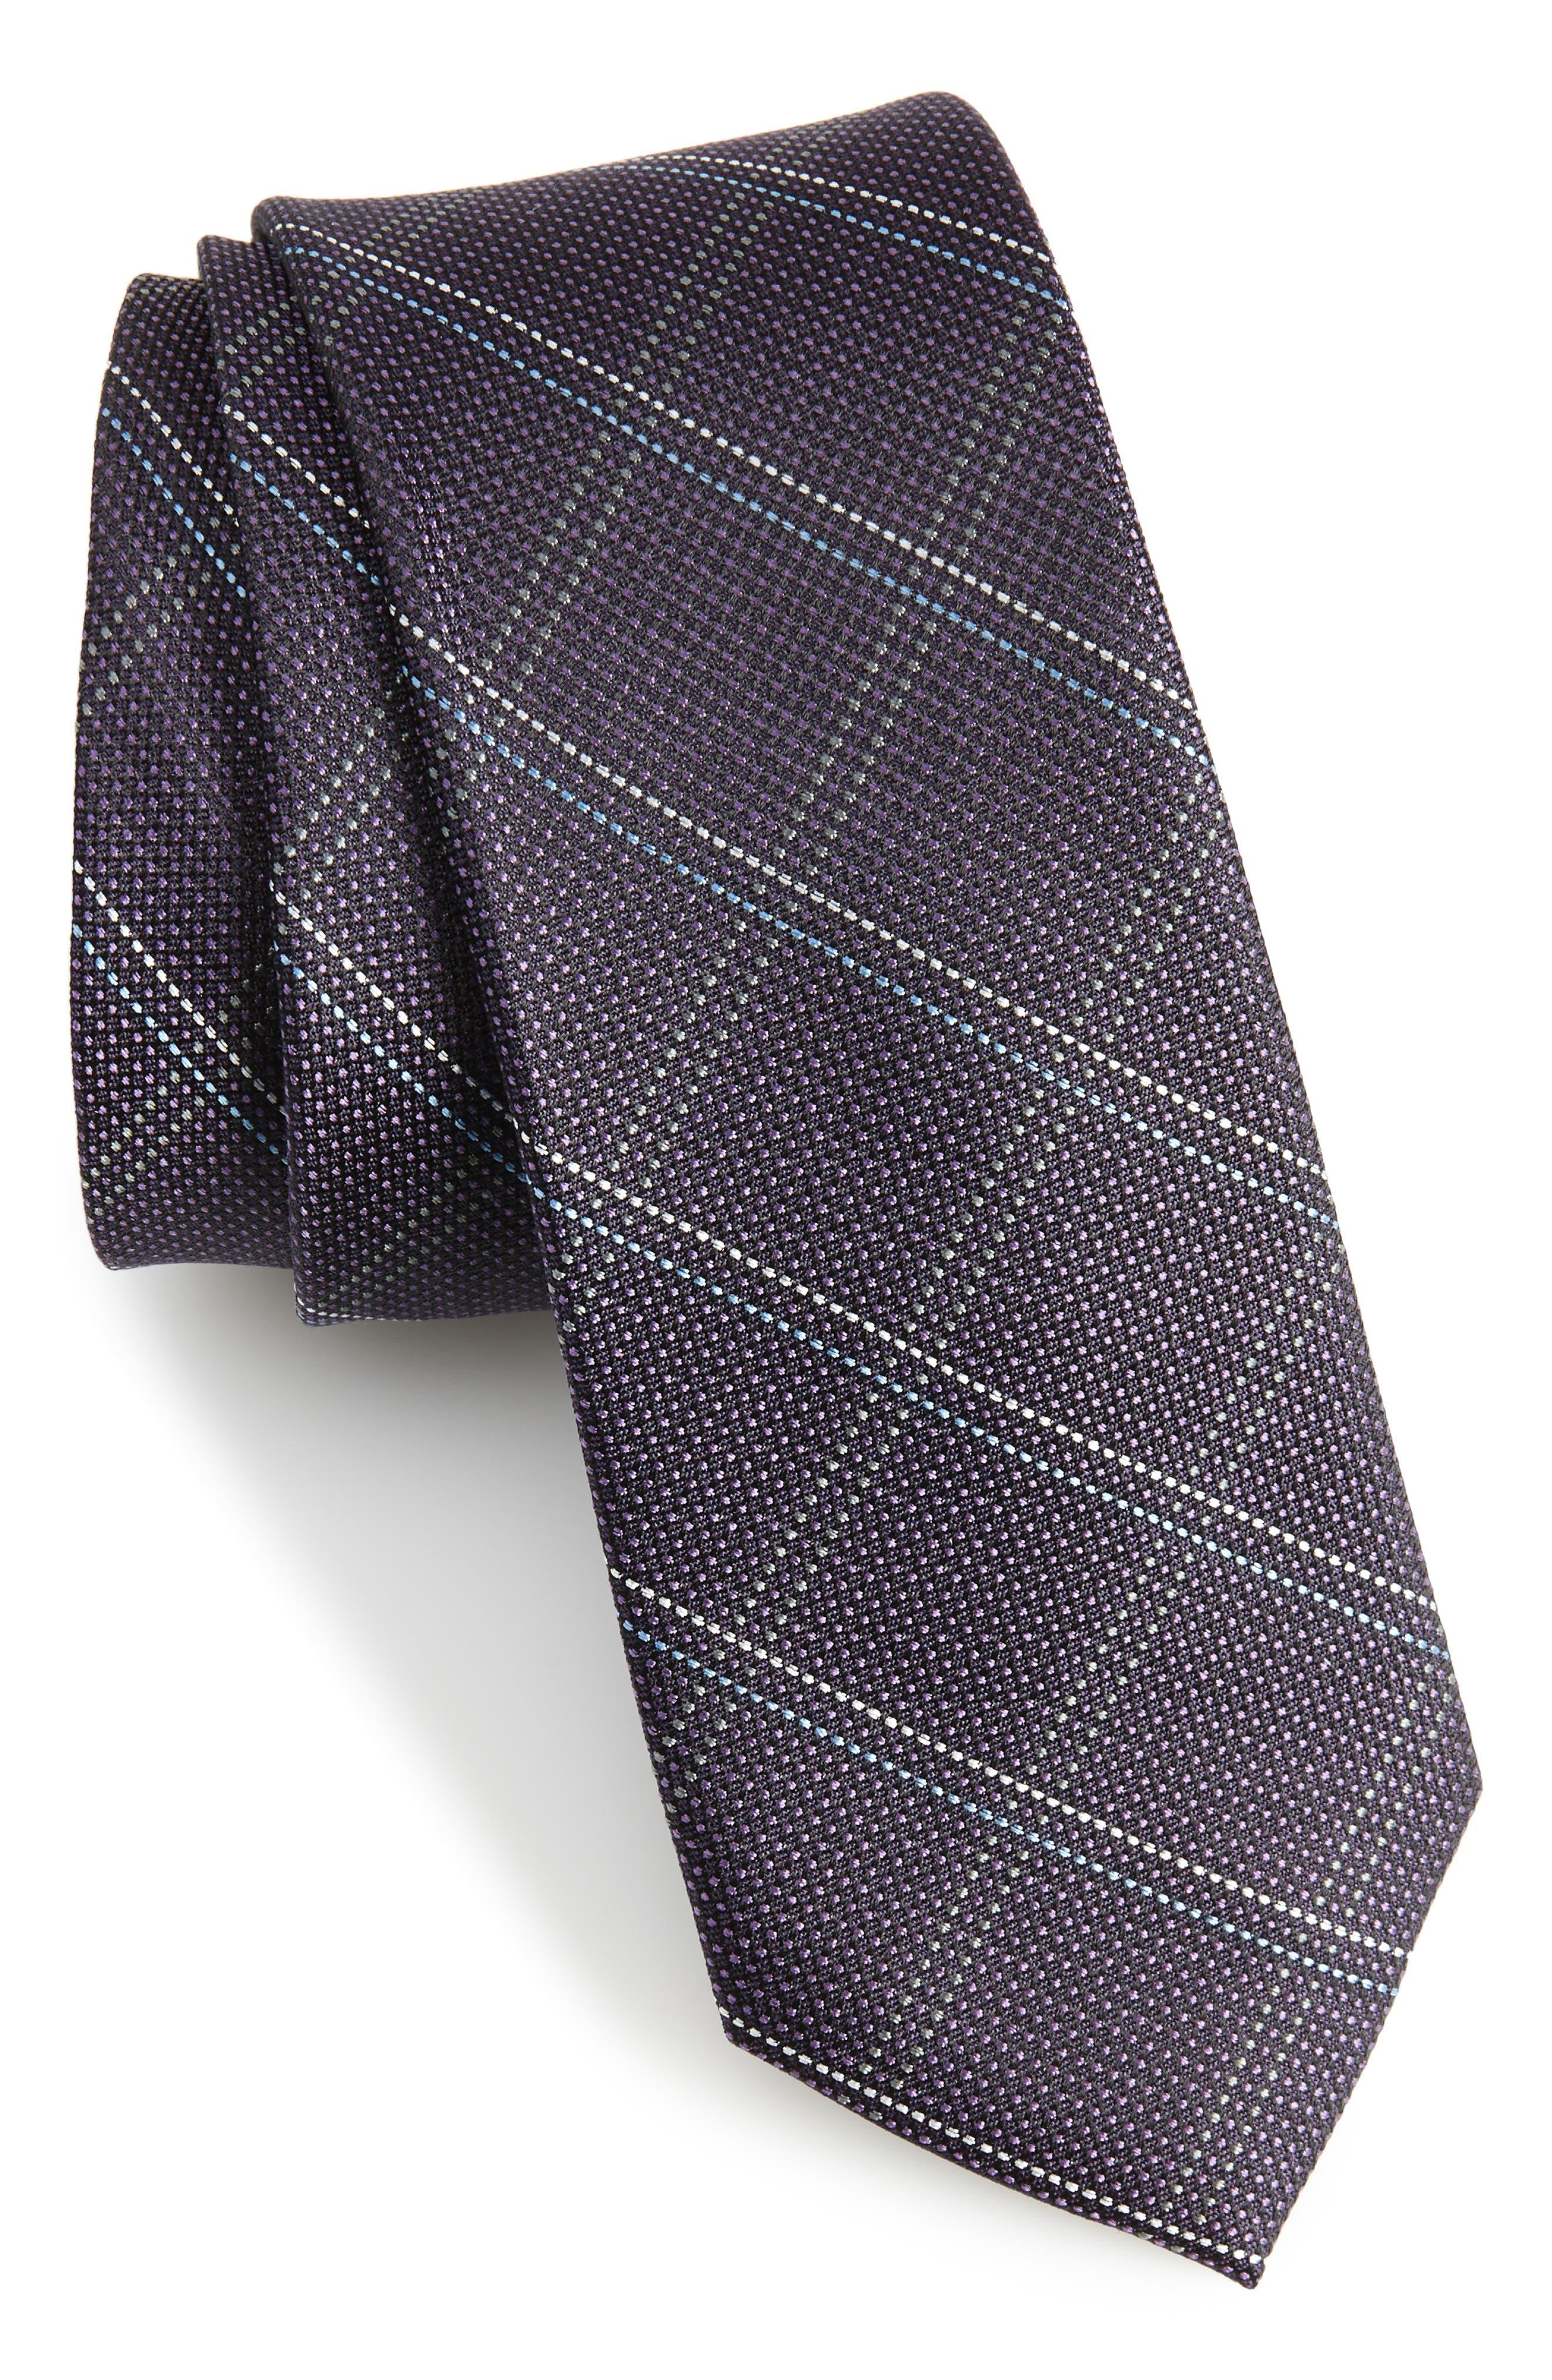 Wingman Checks Silk Skinny Tie,                         Main,                         color, Eggplant